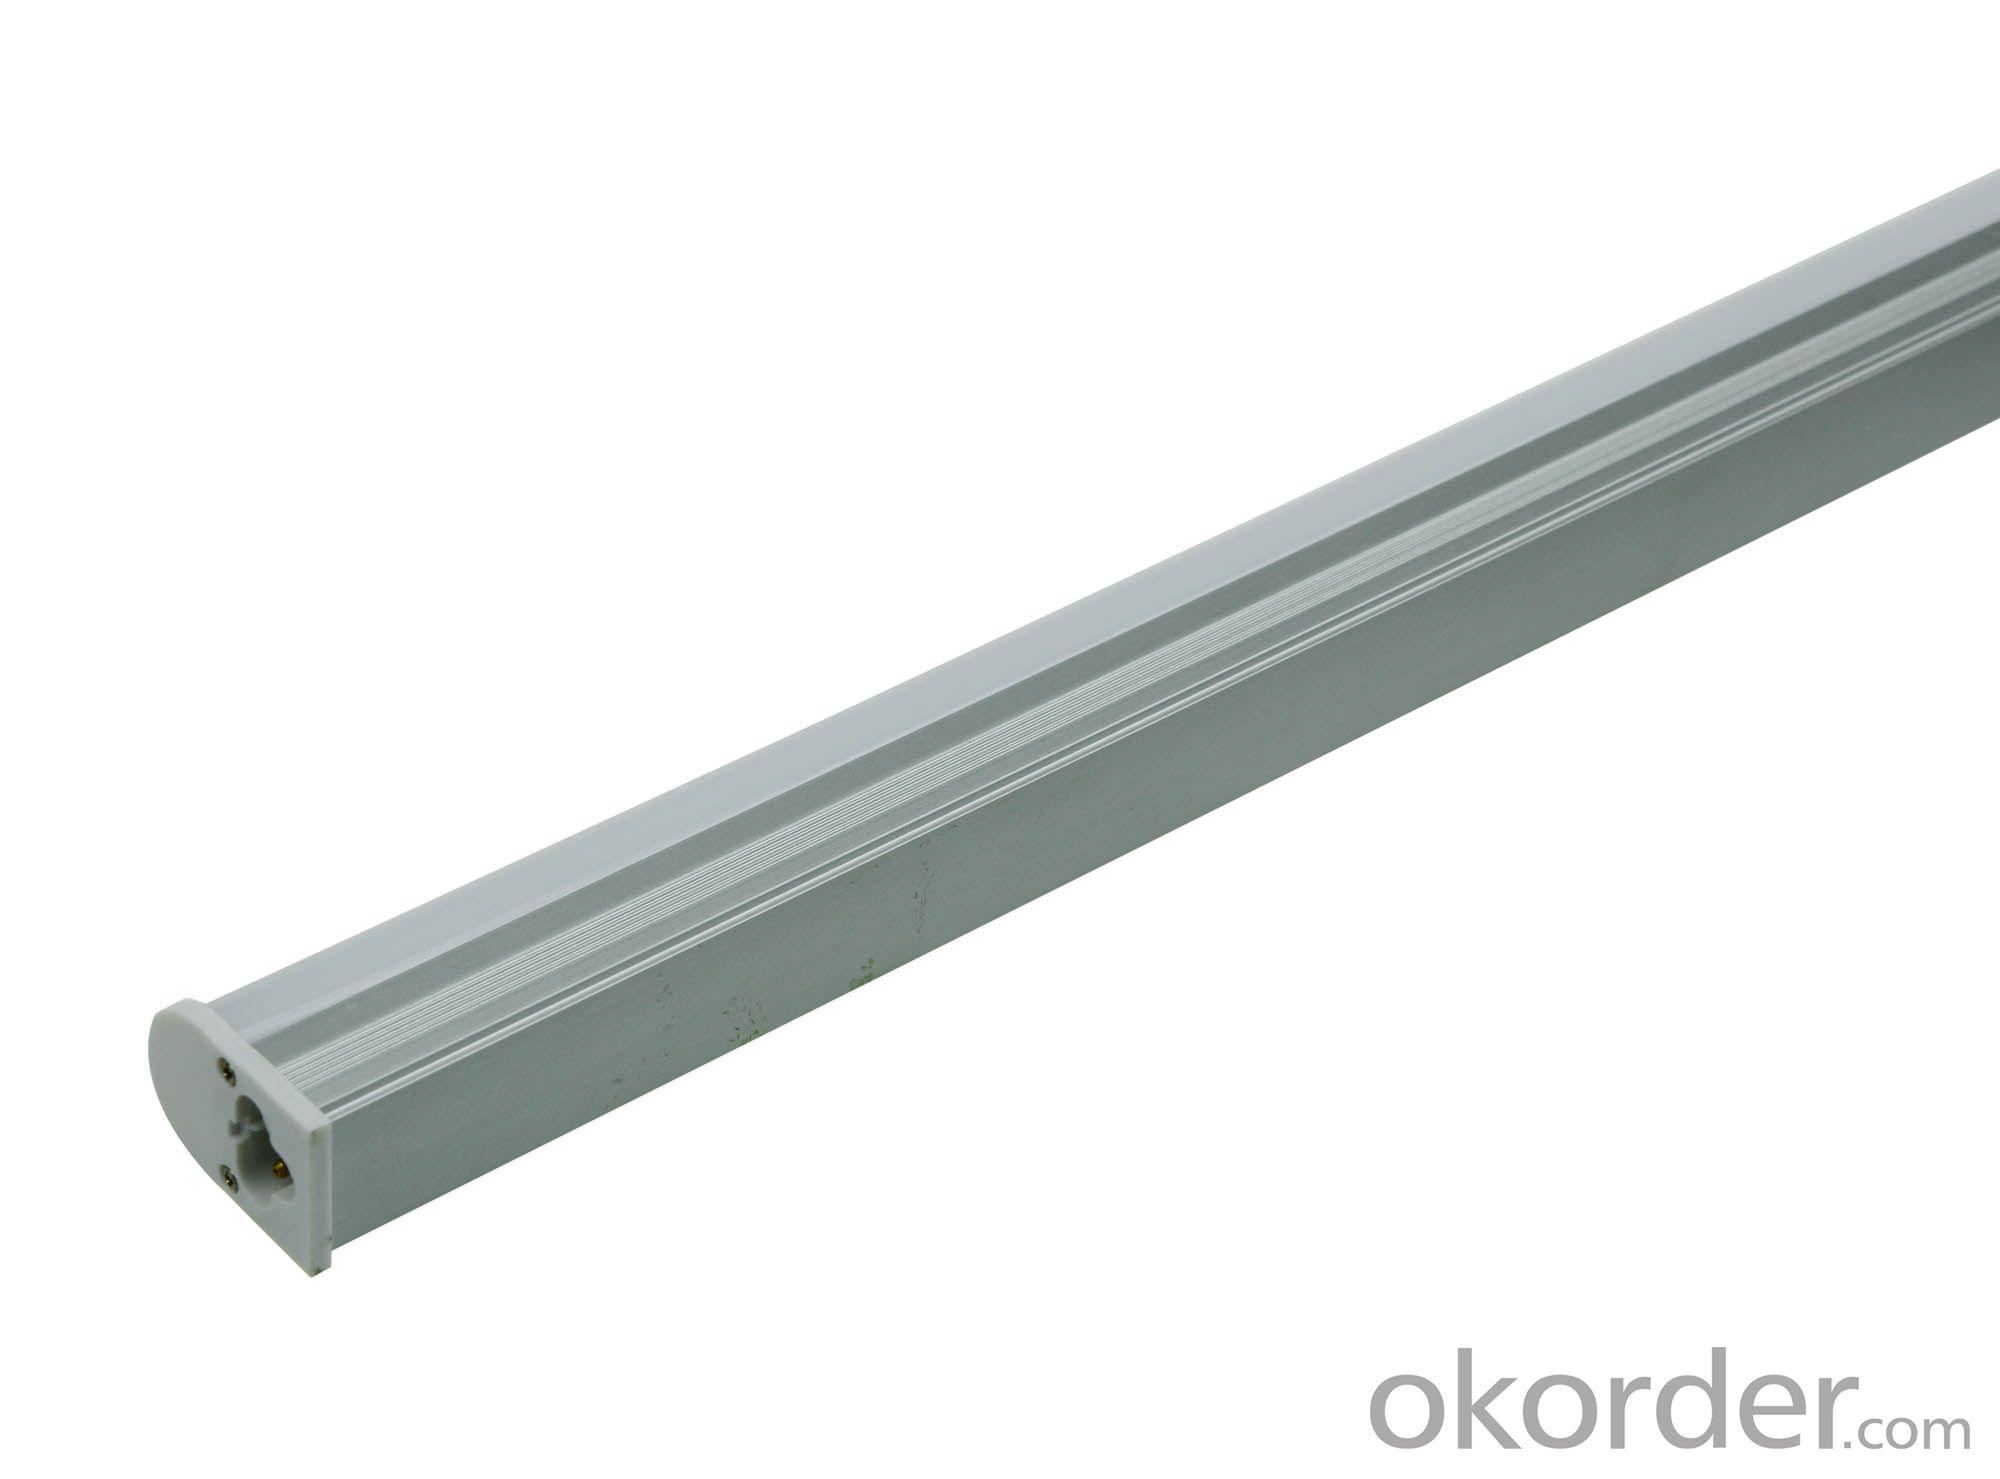 LED Lighting Integrated L CE RoHS TUV ETL t5 Bracket Lamp